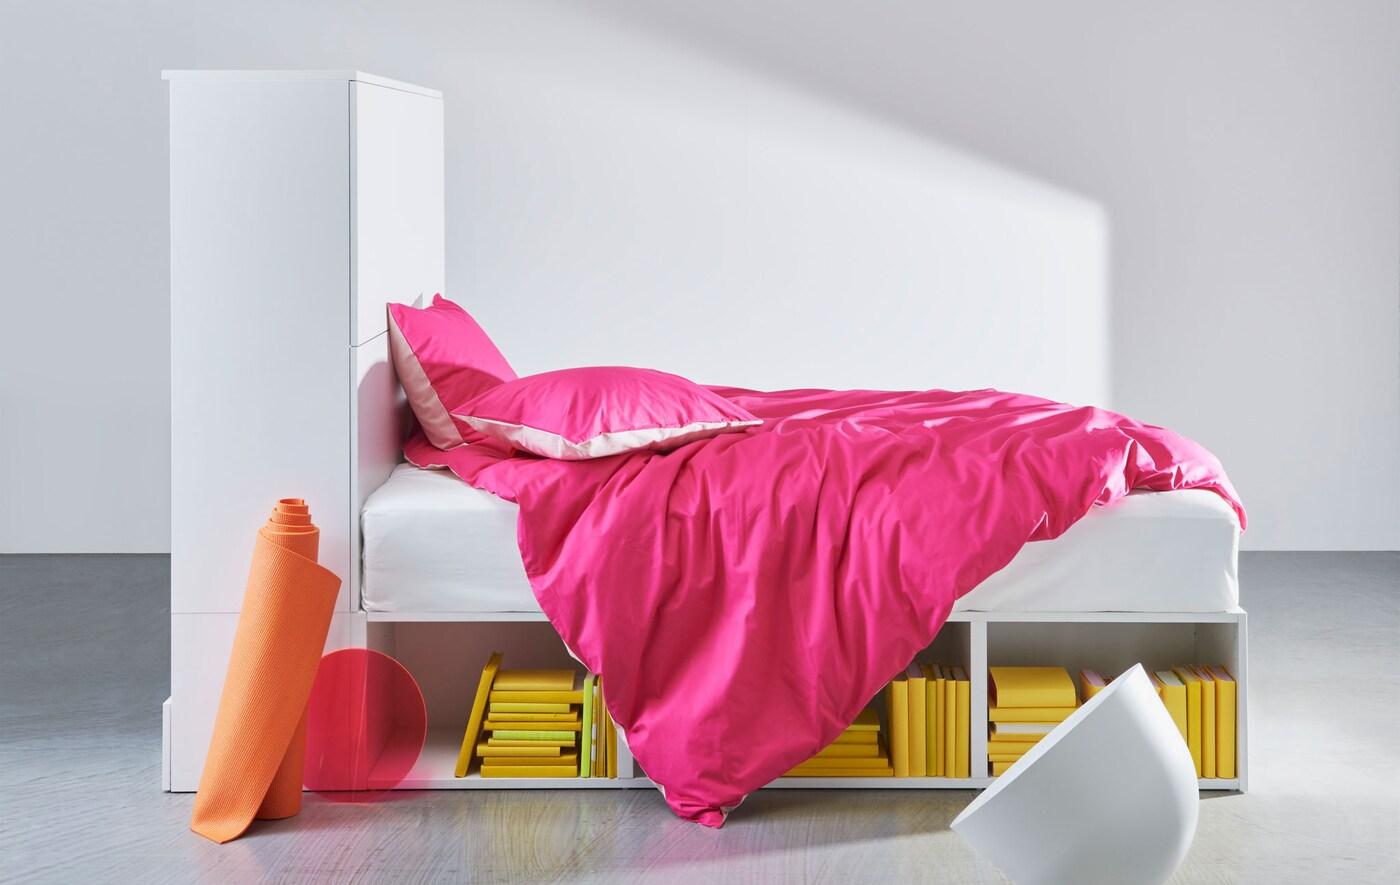 Bílý rám postele s růžovým povlečením